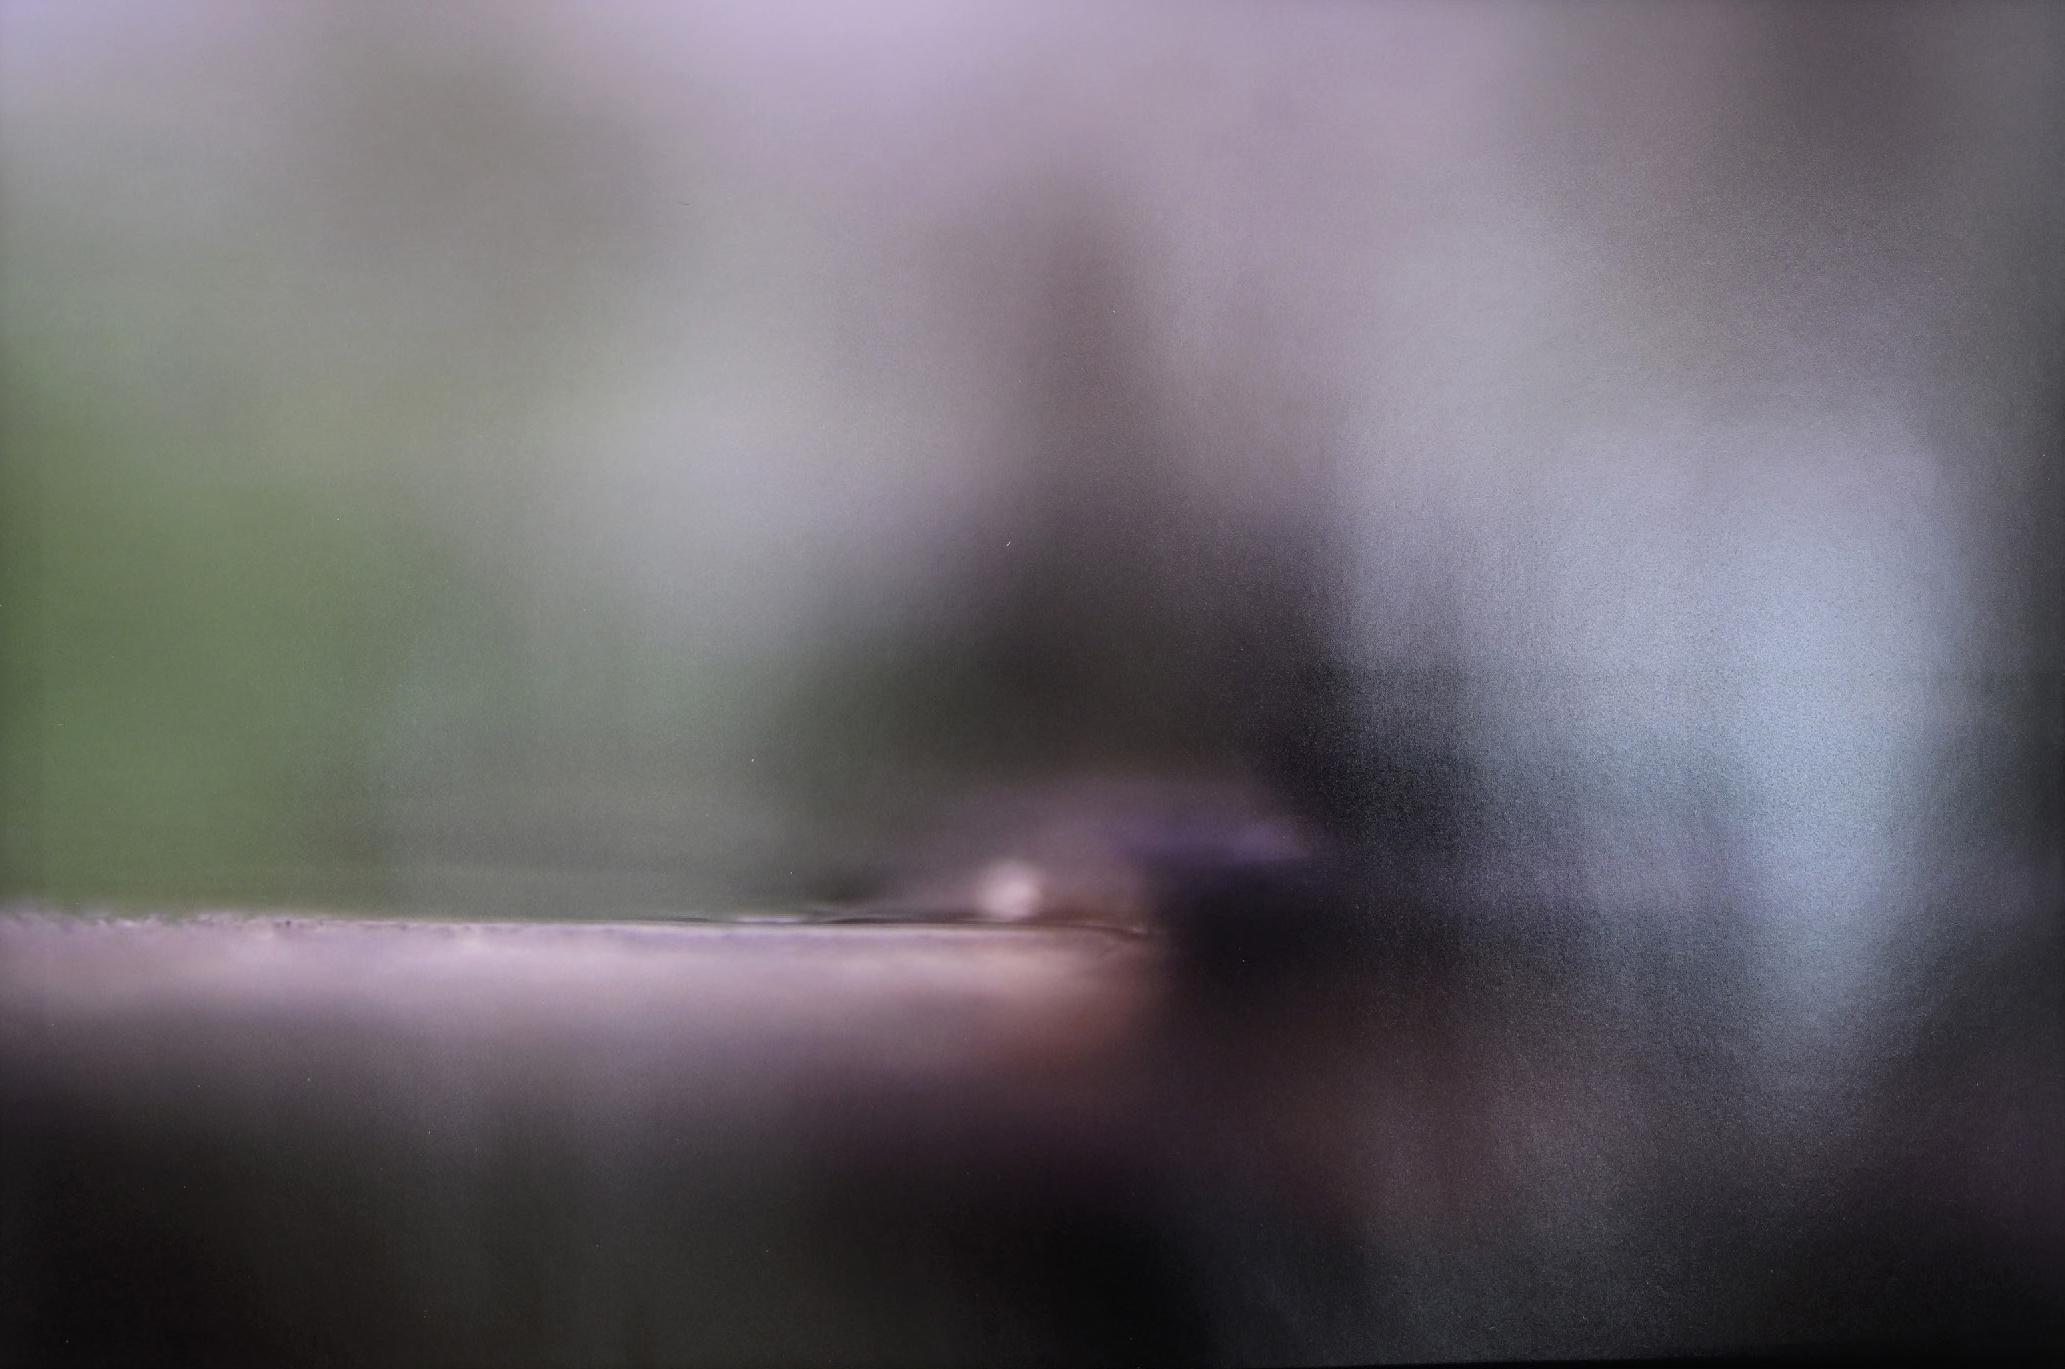 Lot 86 - Cornil Martine (XXe-XXIe ) Bords de monde - Photography - 50 x 70 cm -